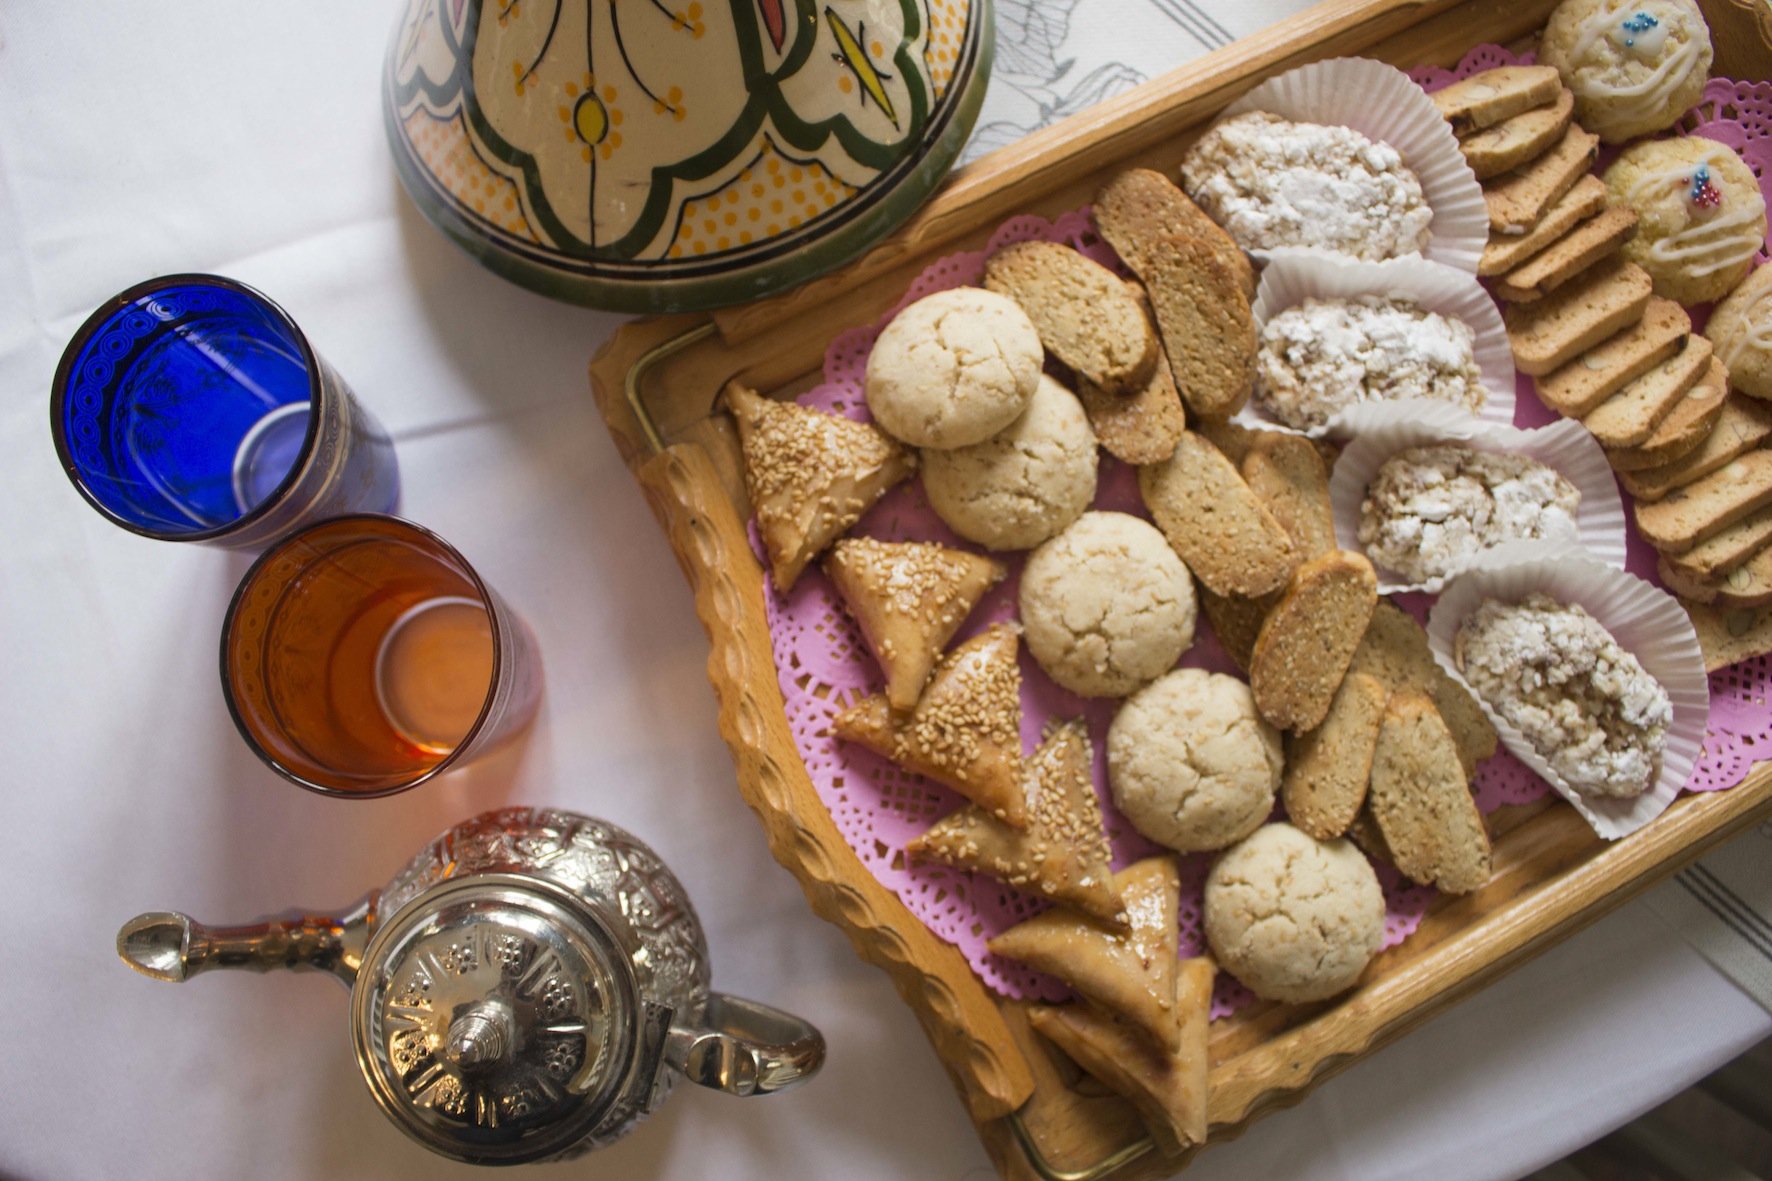 Dryck & Dessert